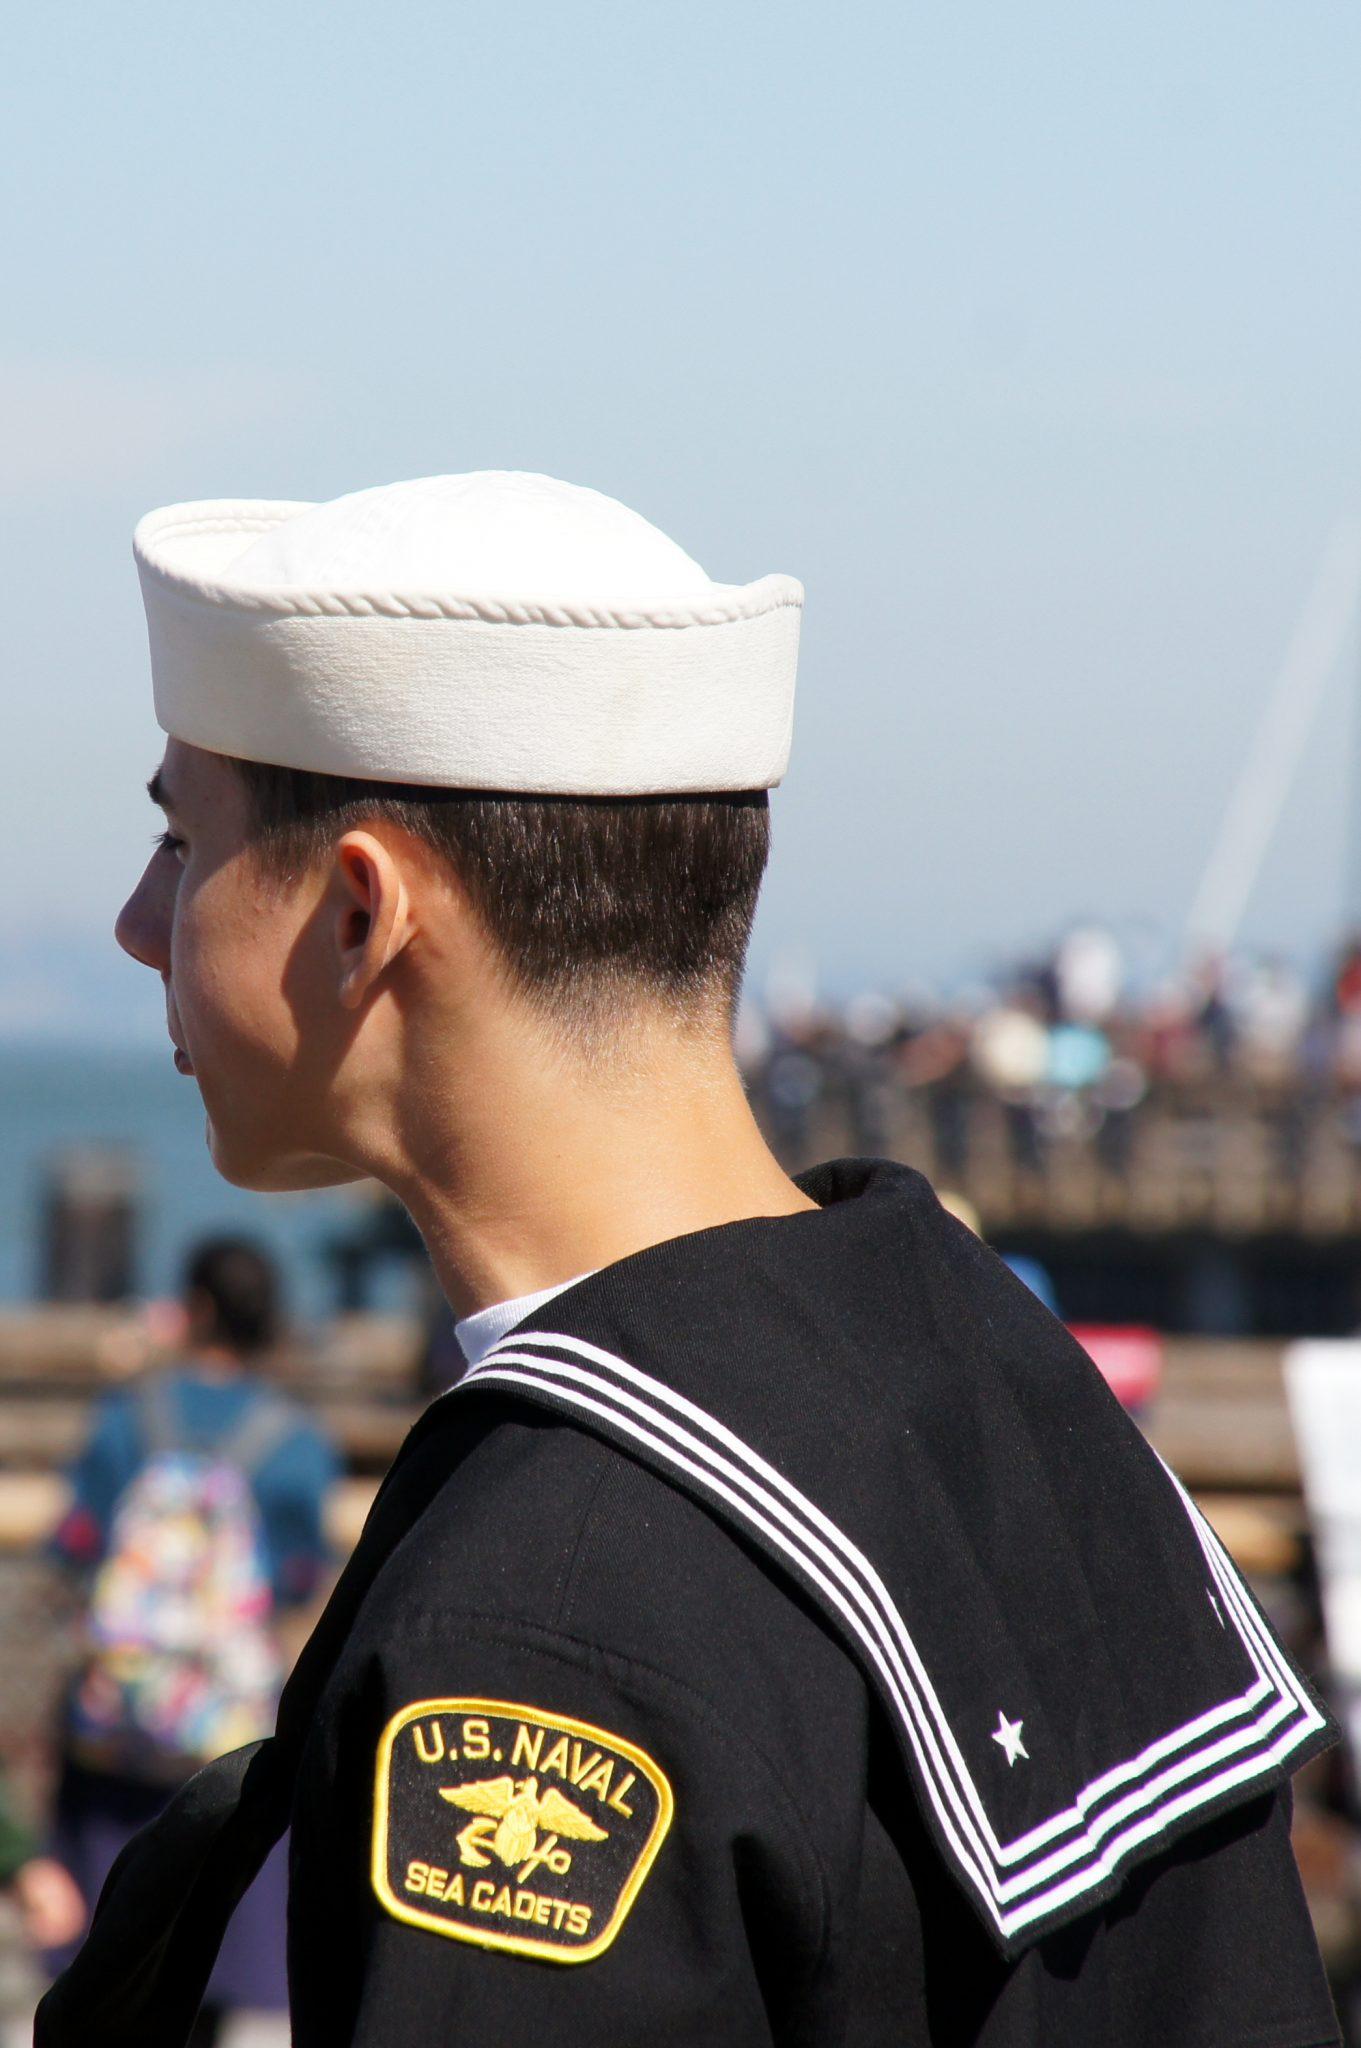 U.S Naval in his uniform